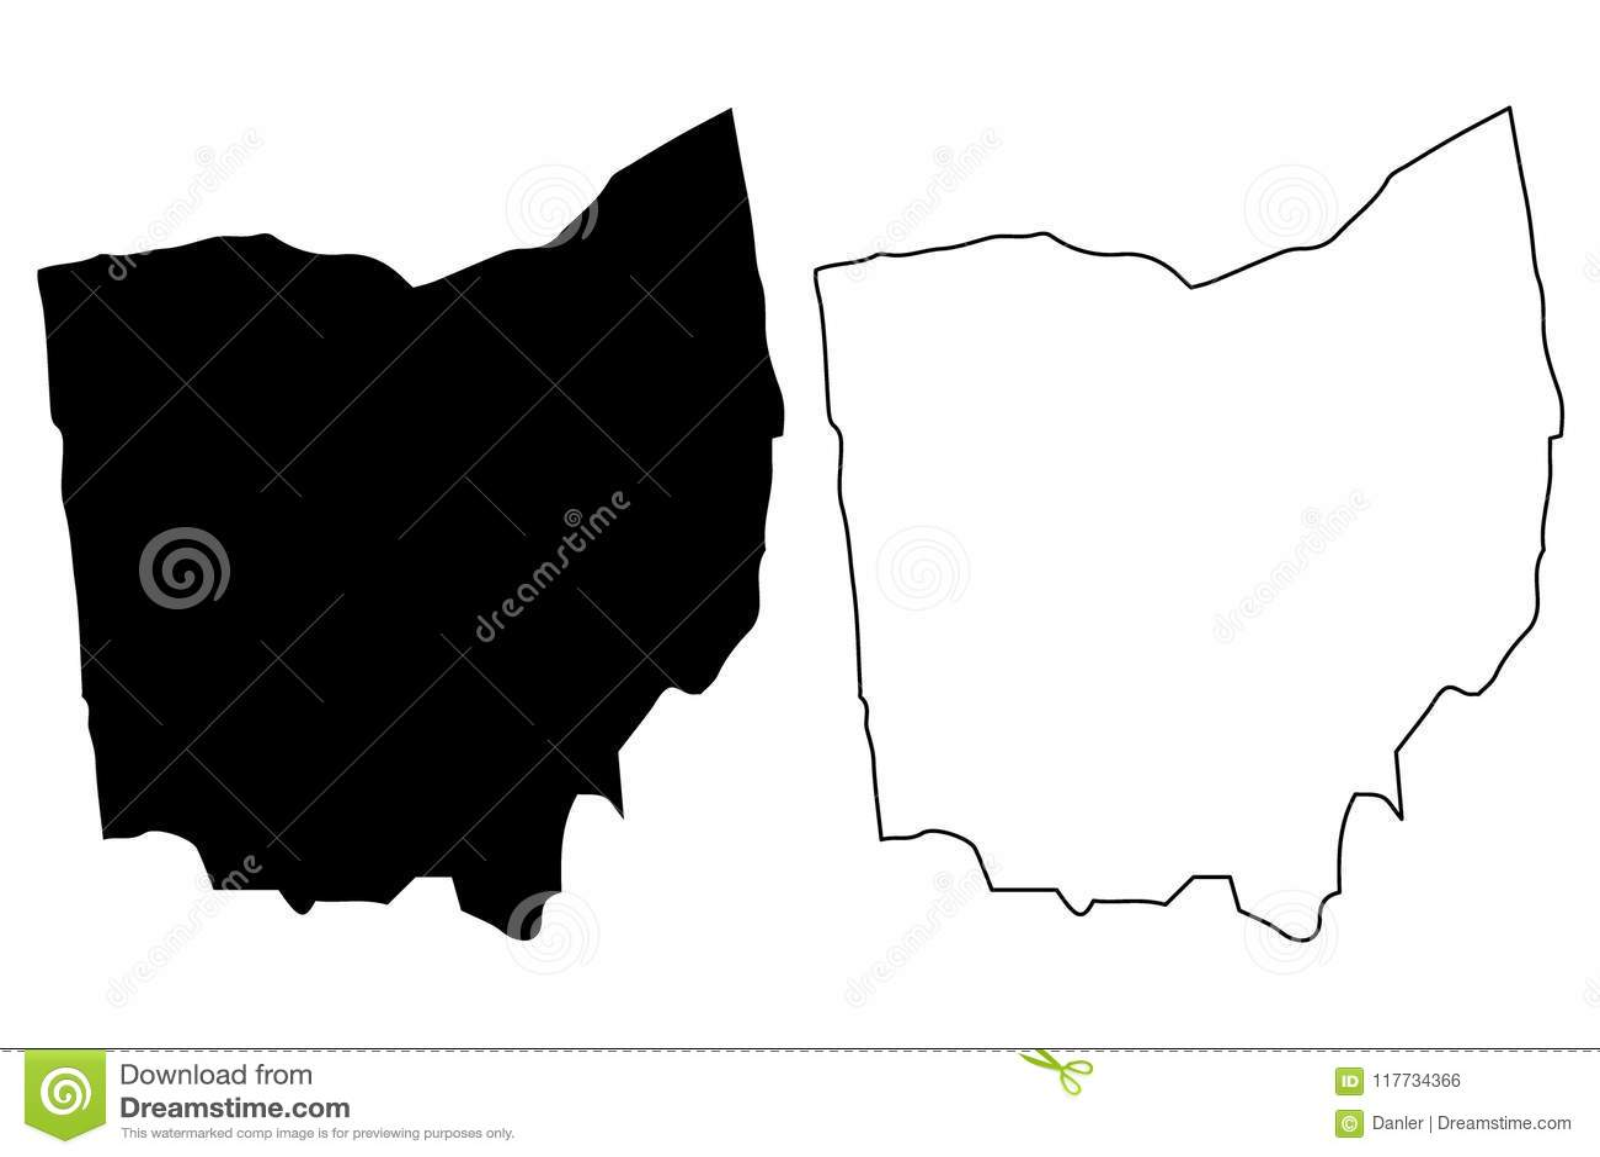 Free Ohio Map.Ohio Map Vector Stock Vector Illustration Of Patriotic 117734366